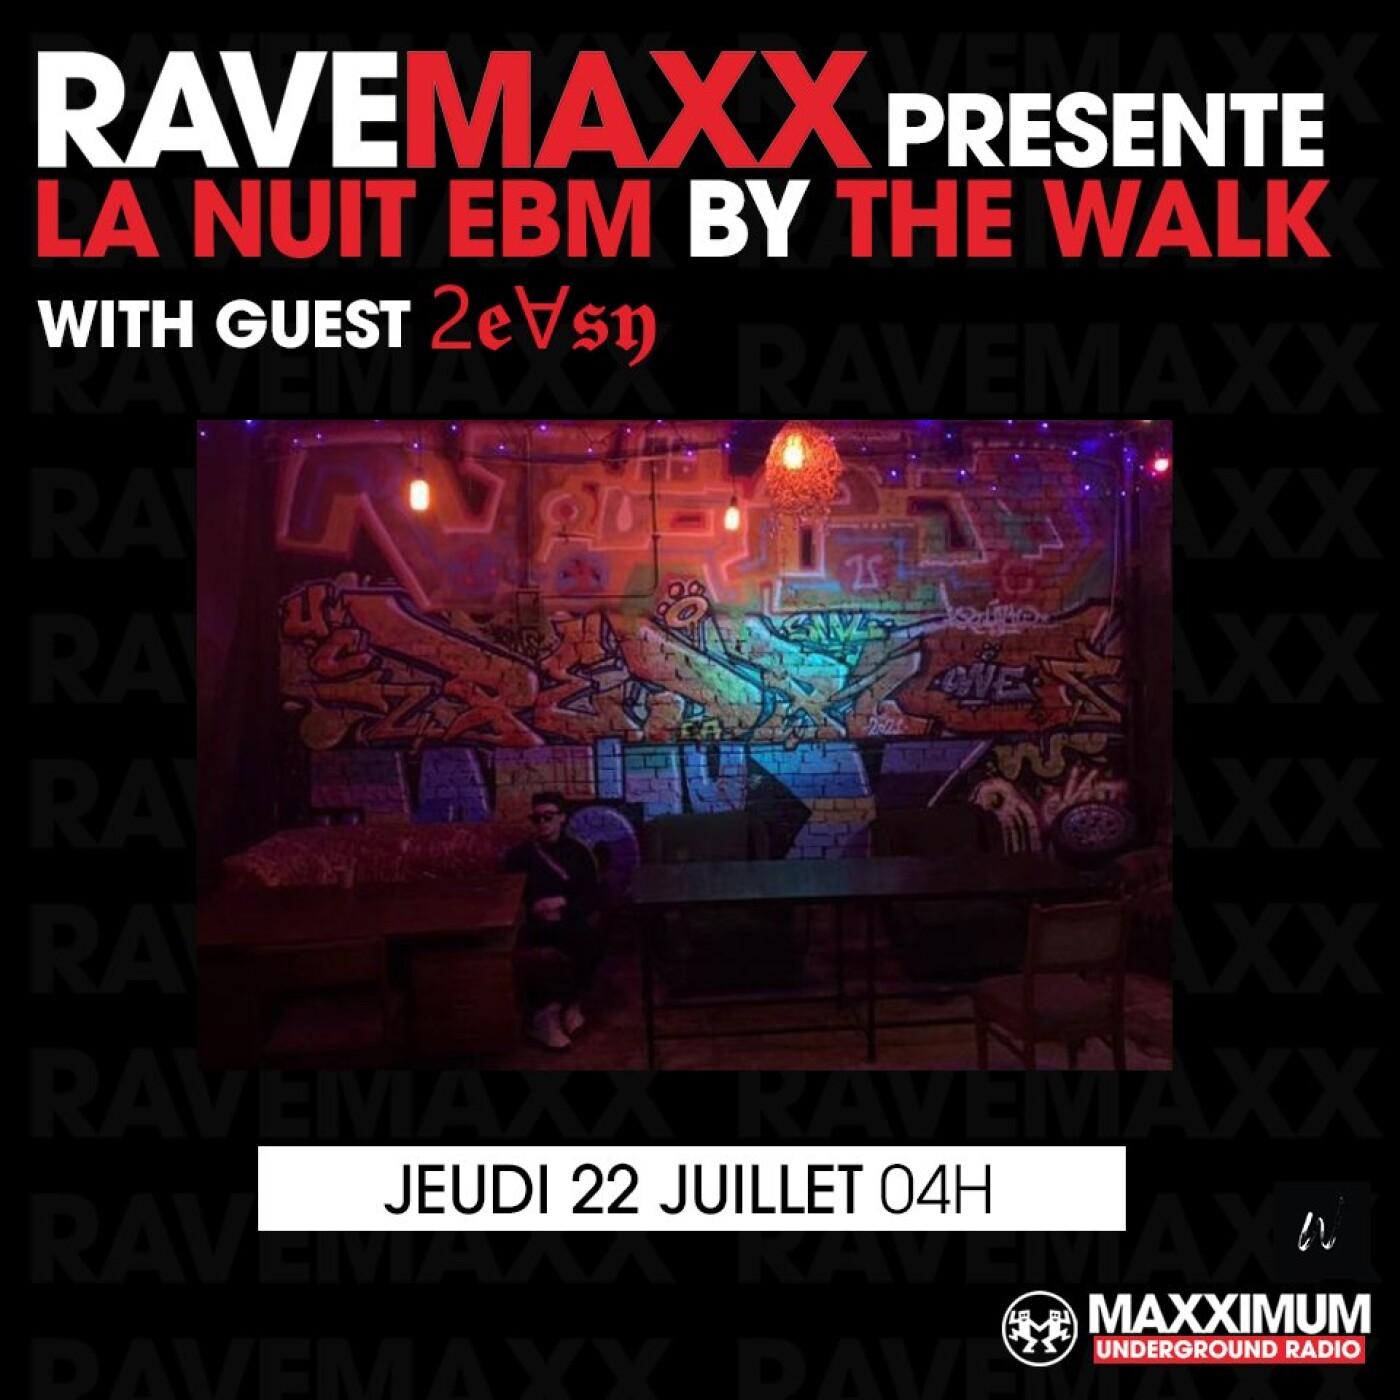 RAVEMAXX : 2eAsn